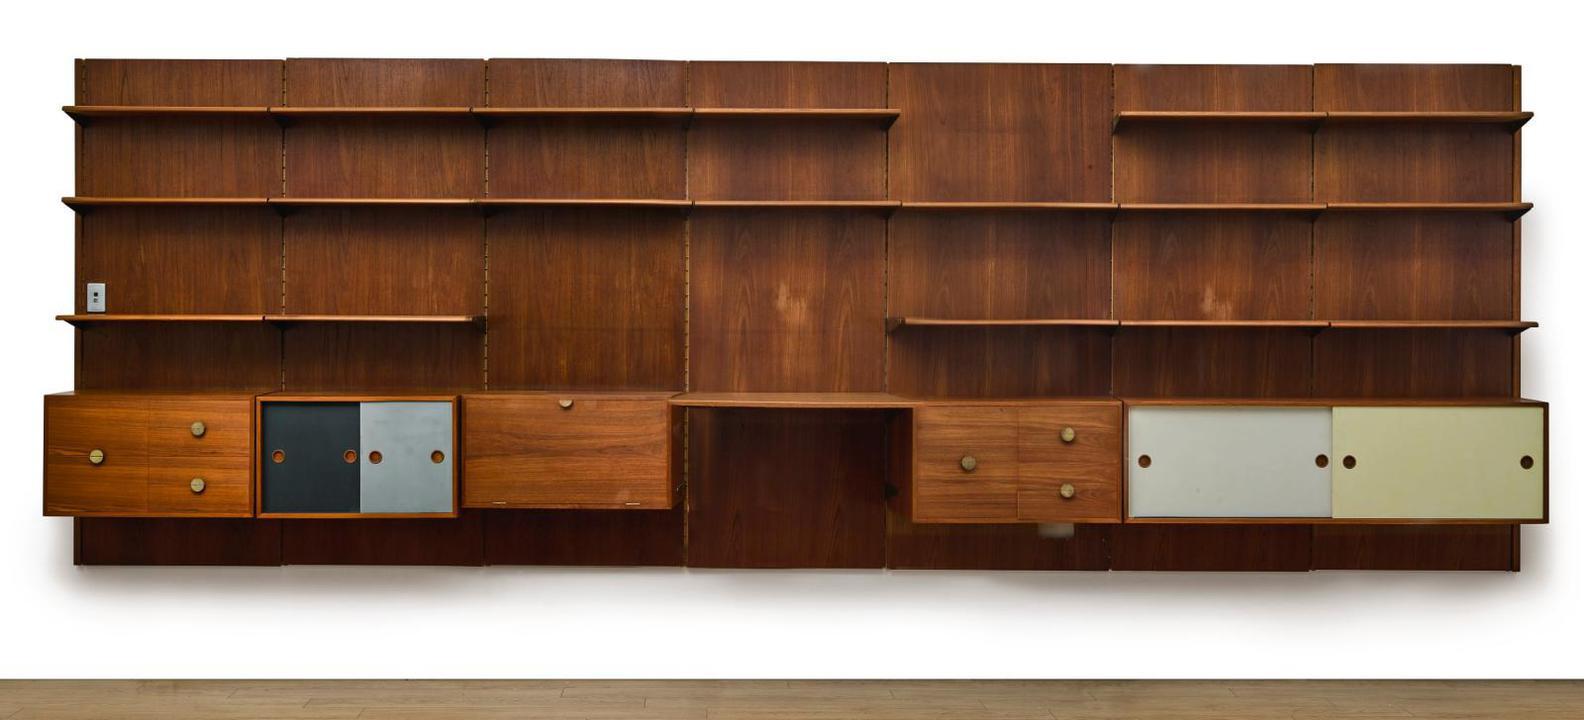 Finn Juhl-Seven Panel Modular Wall System-1955